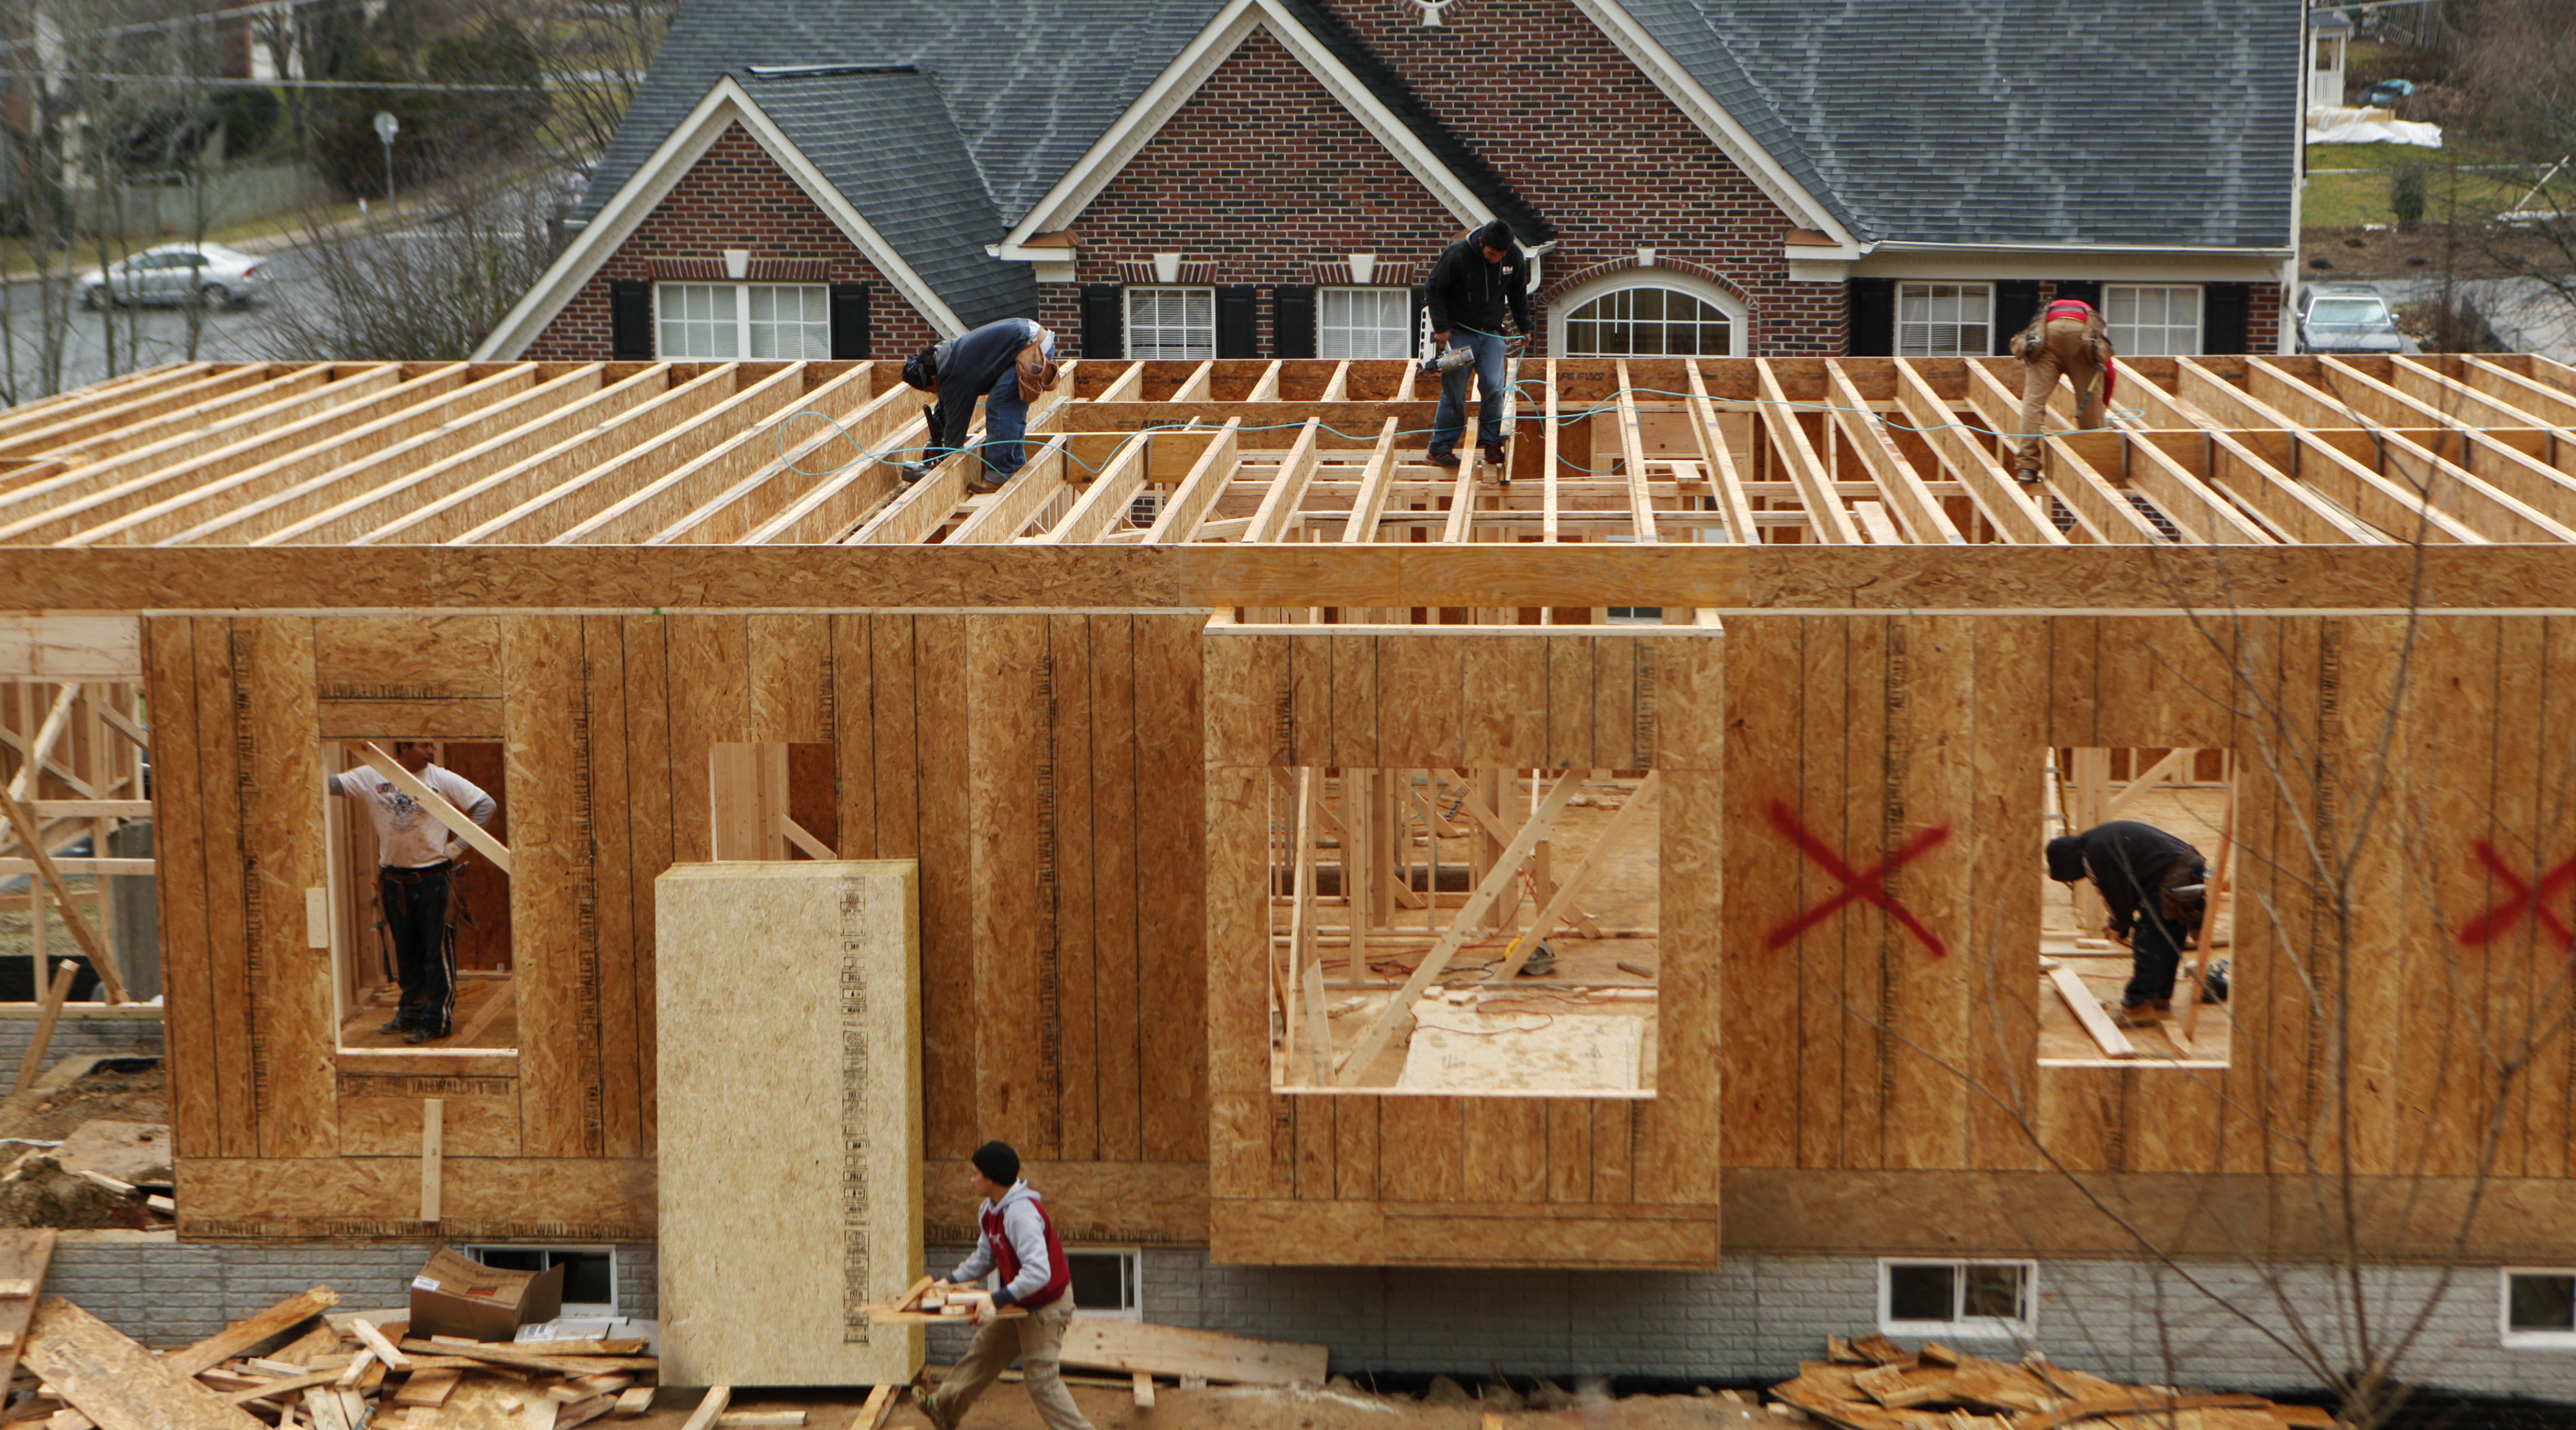 Builders work on a house in Alexandria, Virginia